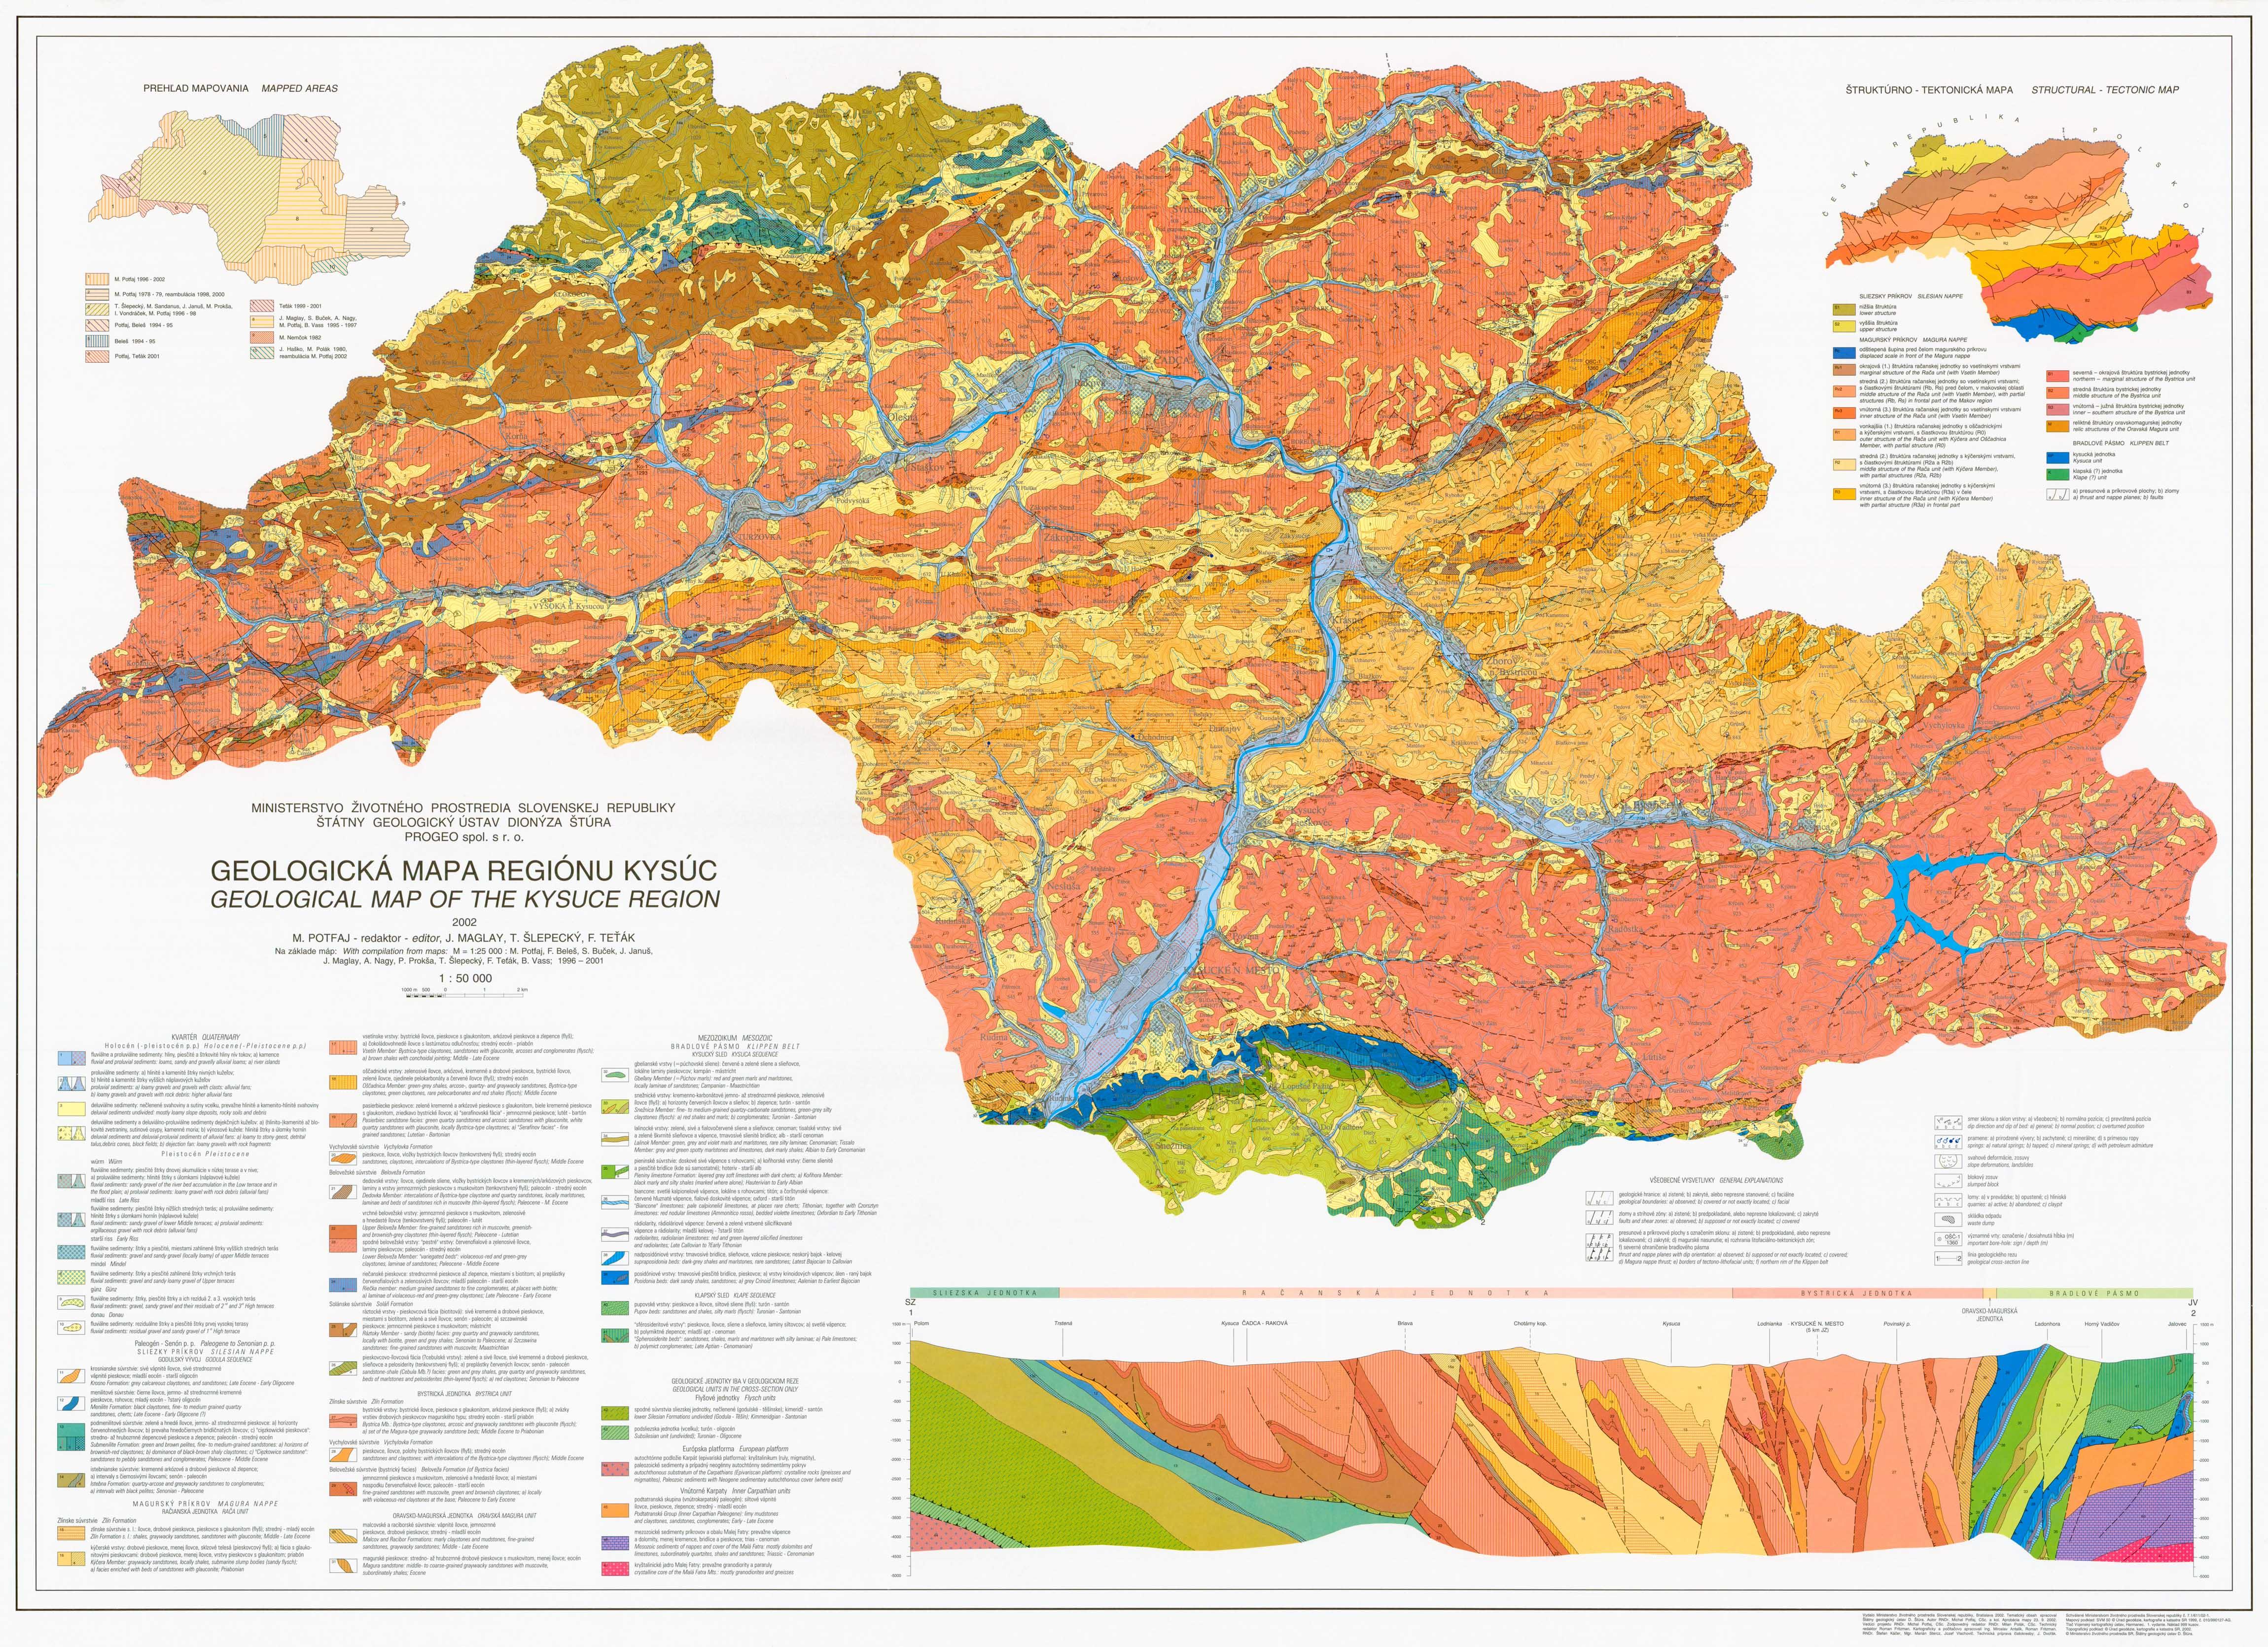 Geologická mapa regiónu Kysuce 1:50 000